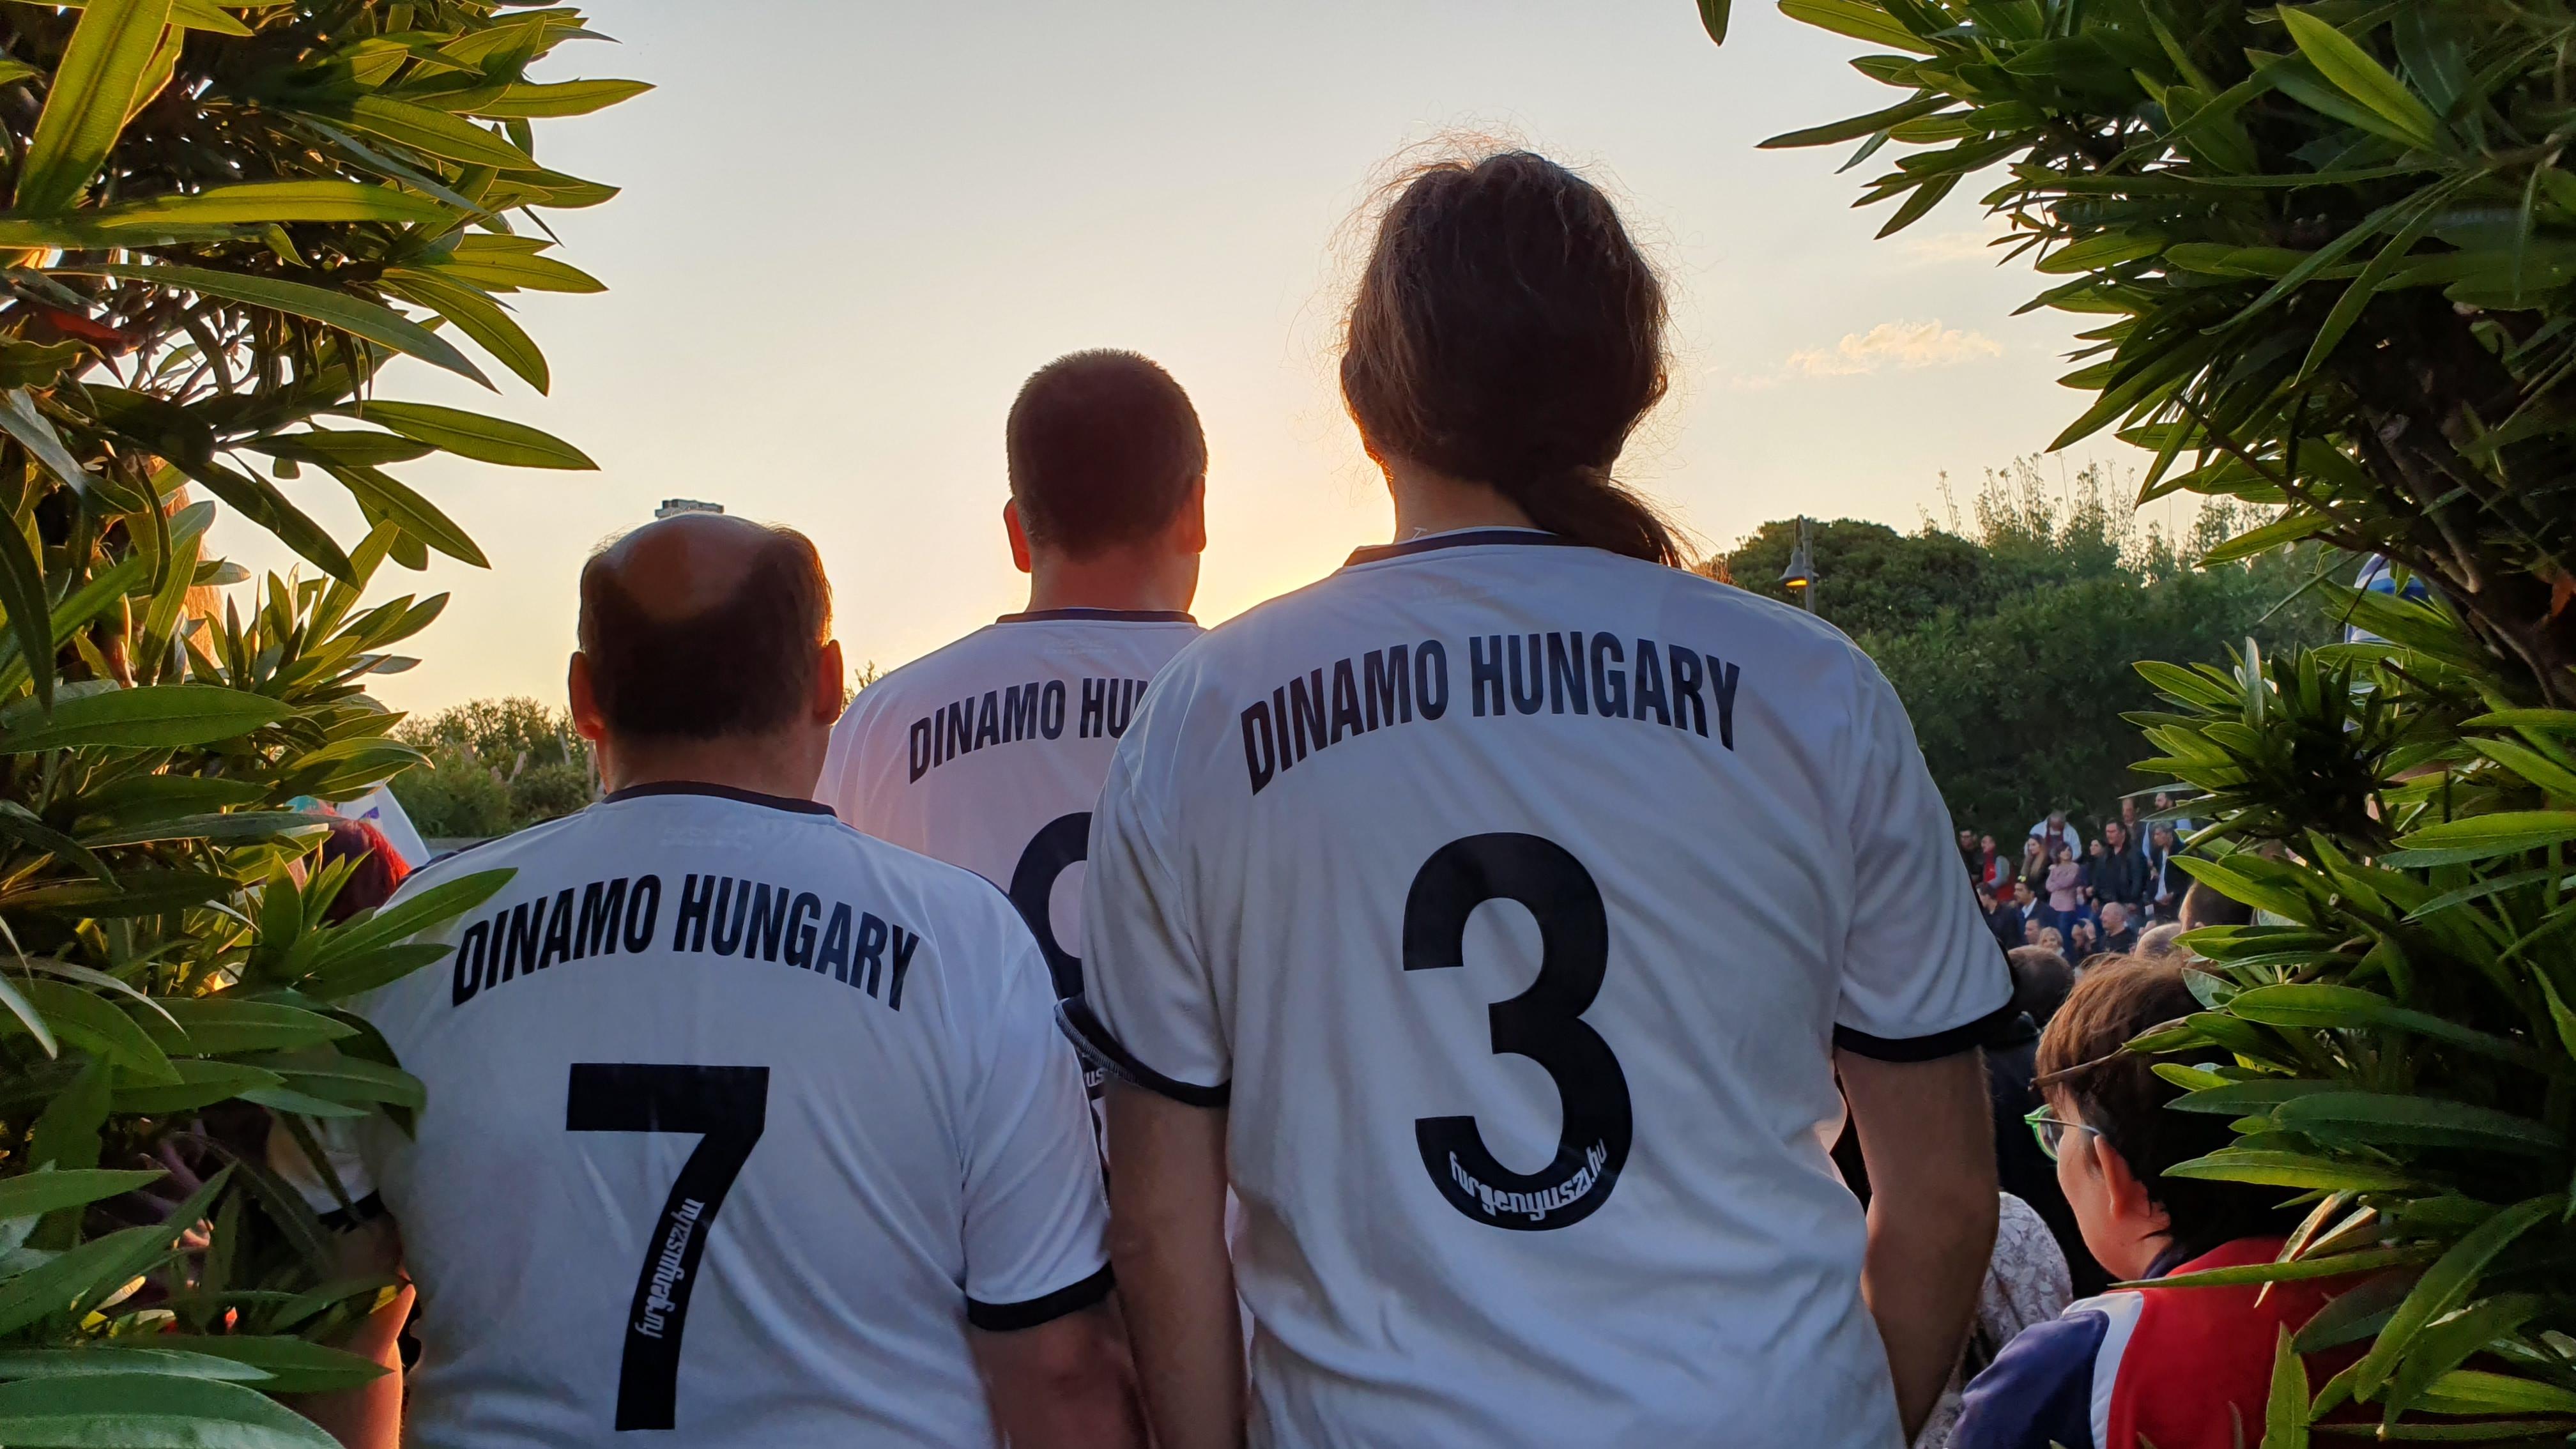 Dinamo Hungary